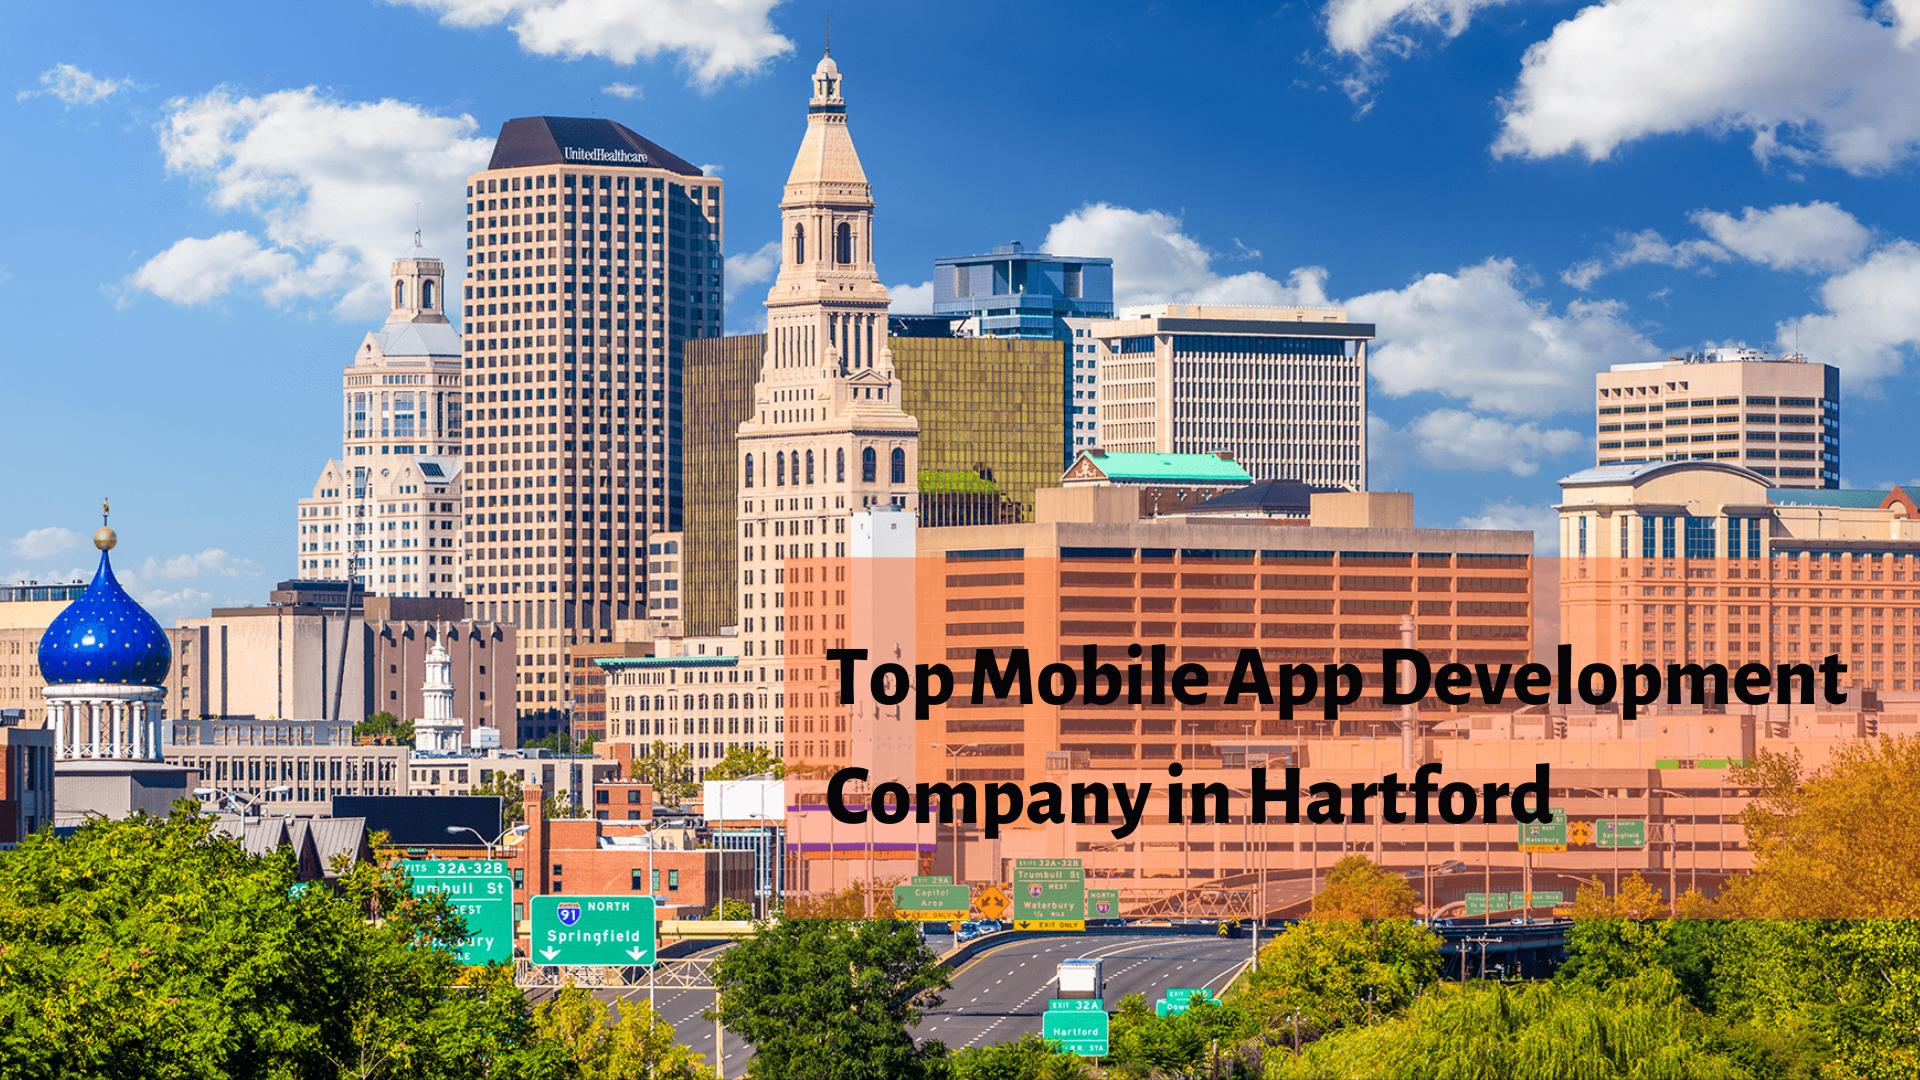 Top Mobile App Development Company in Hartford - WebClues Infotech